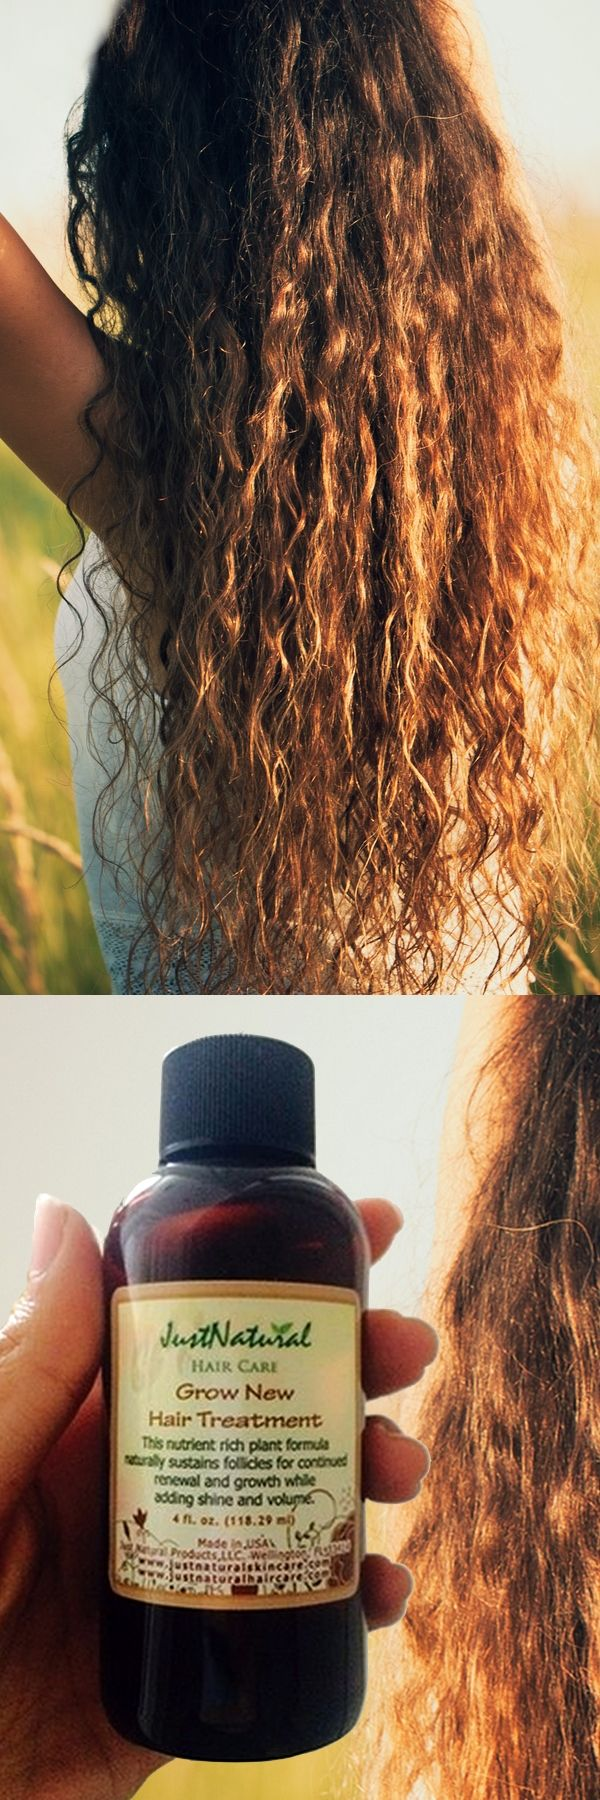 Grow New Hair Treatment Encourage Scalp To Grow New Hair to Grow Your Hair…